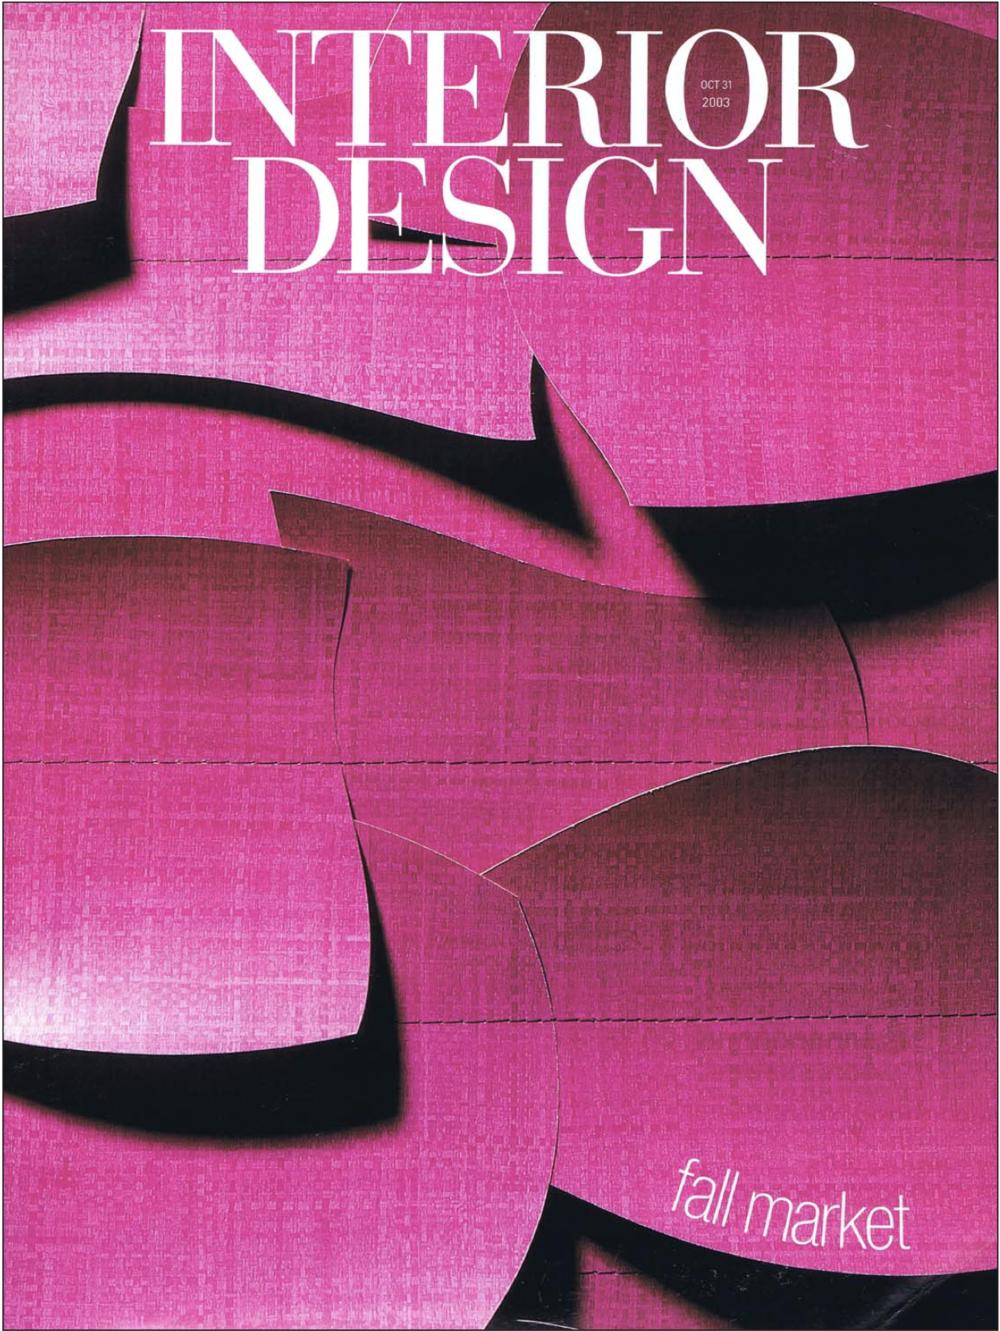 reeta-gyamlani-farrago-design-interior-design-magazine-5